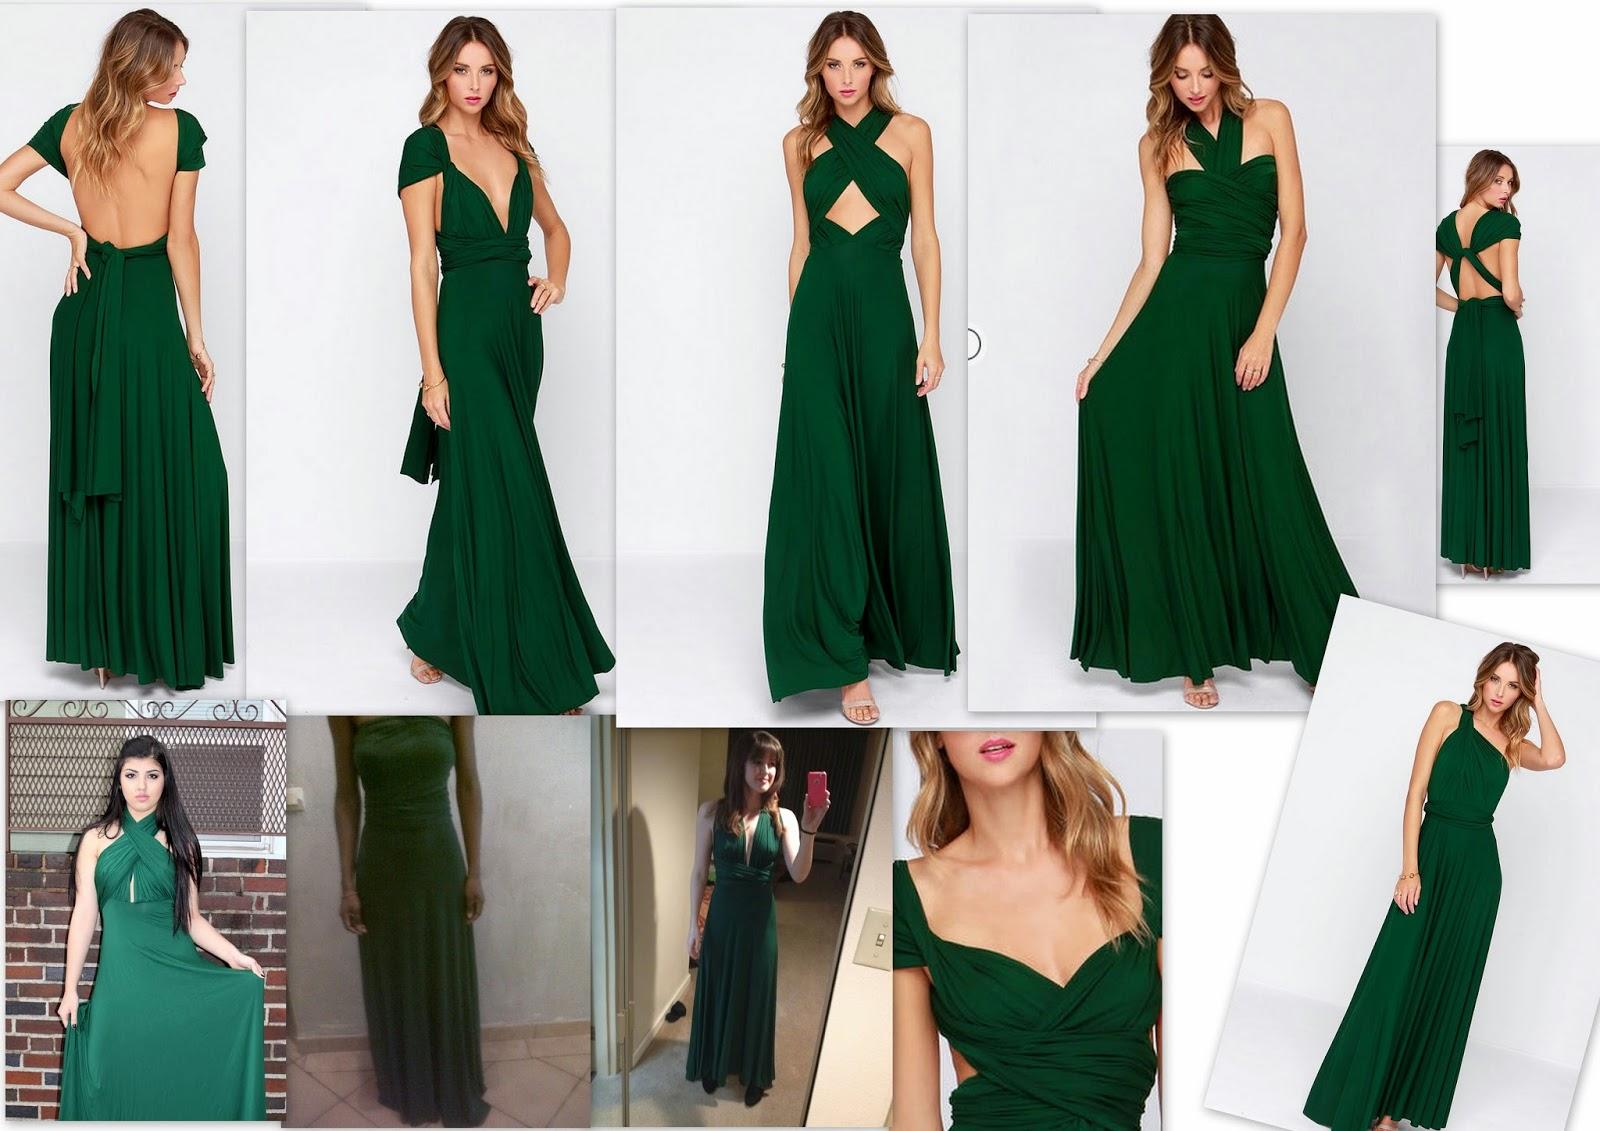 http://www.sheinside.com/Green-Backless-Maxi-Dress-p-194984-cat-1727.html?aff_id=461